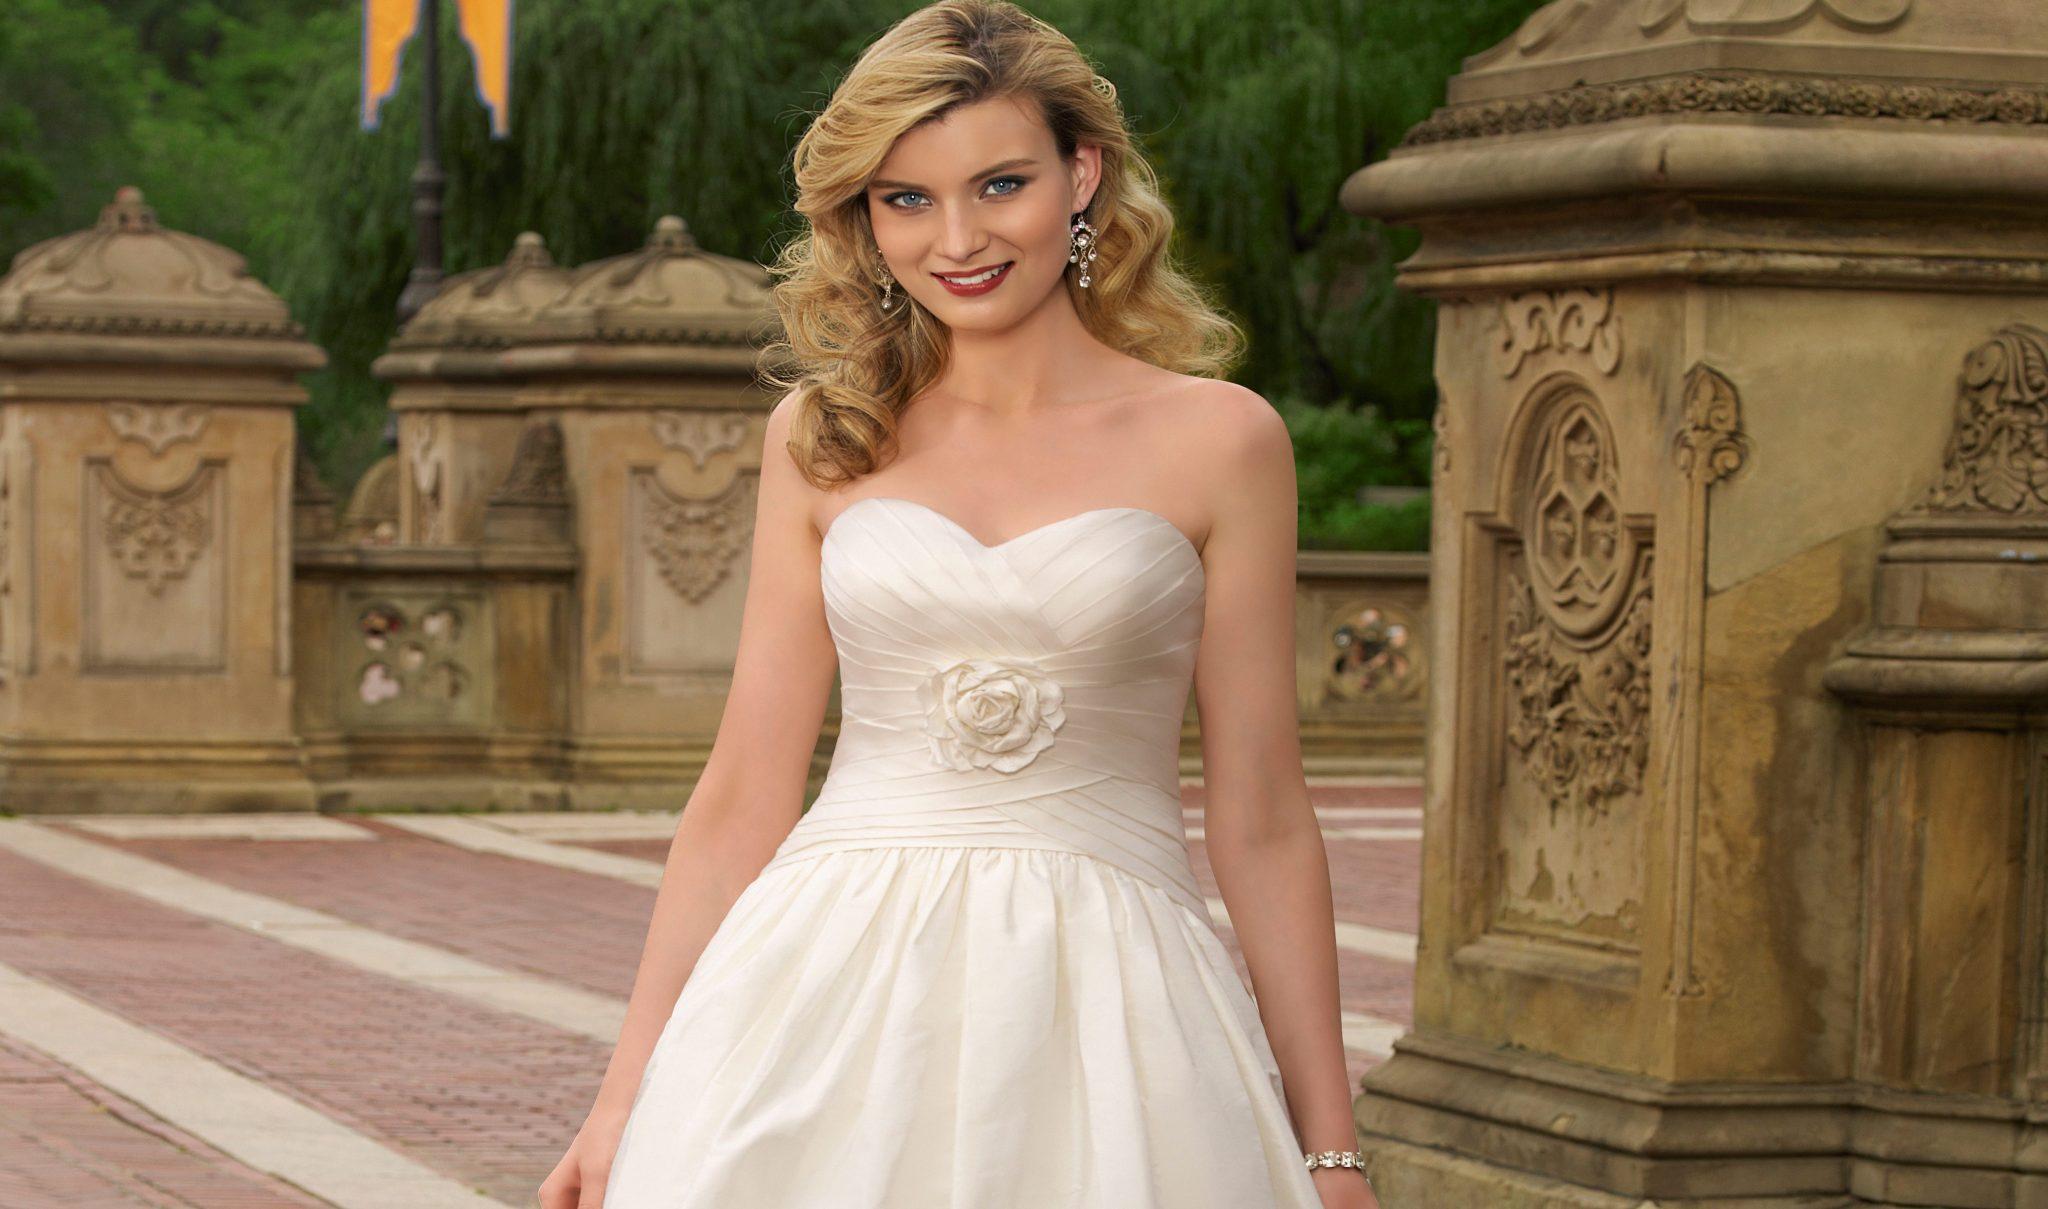 Couture Designs Bridal Boutique Swindon